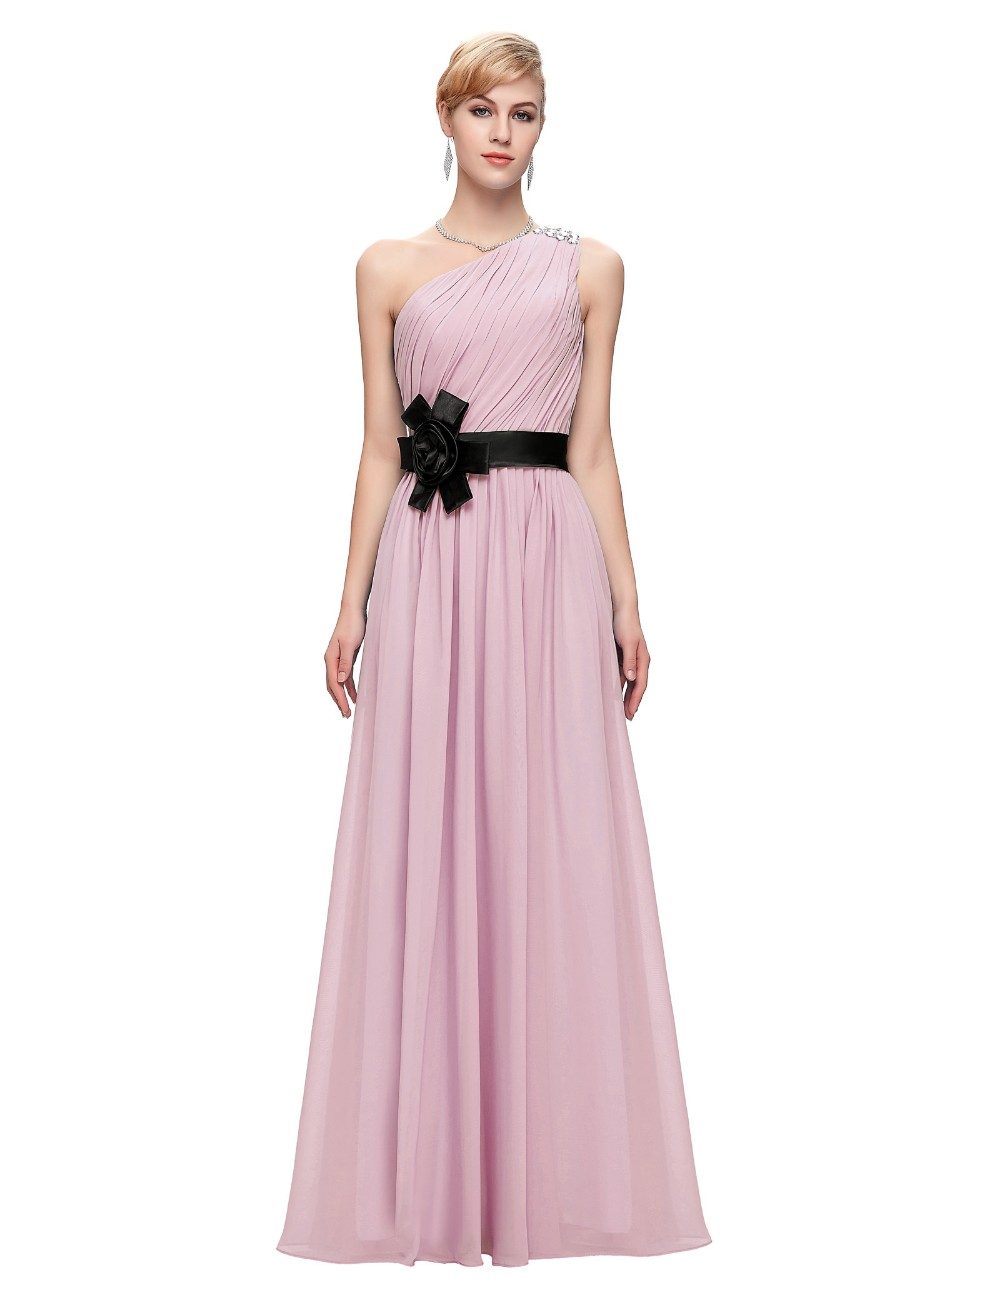 ᐅCheap long Bridesmaid Dresses Purple Pink Yellow Wedding dress ...